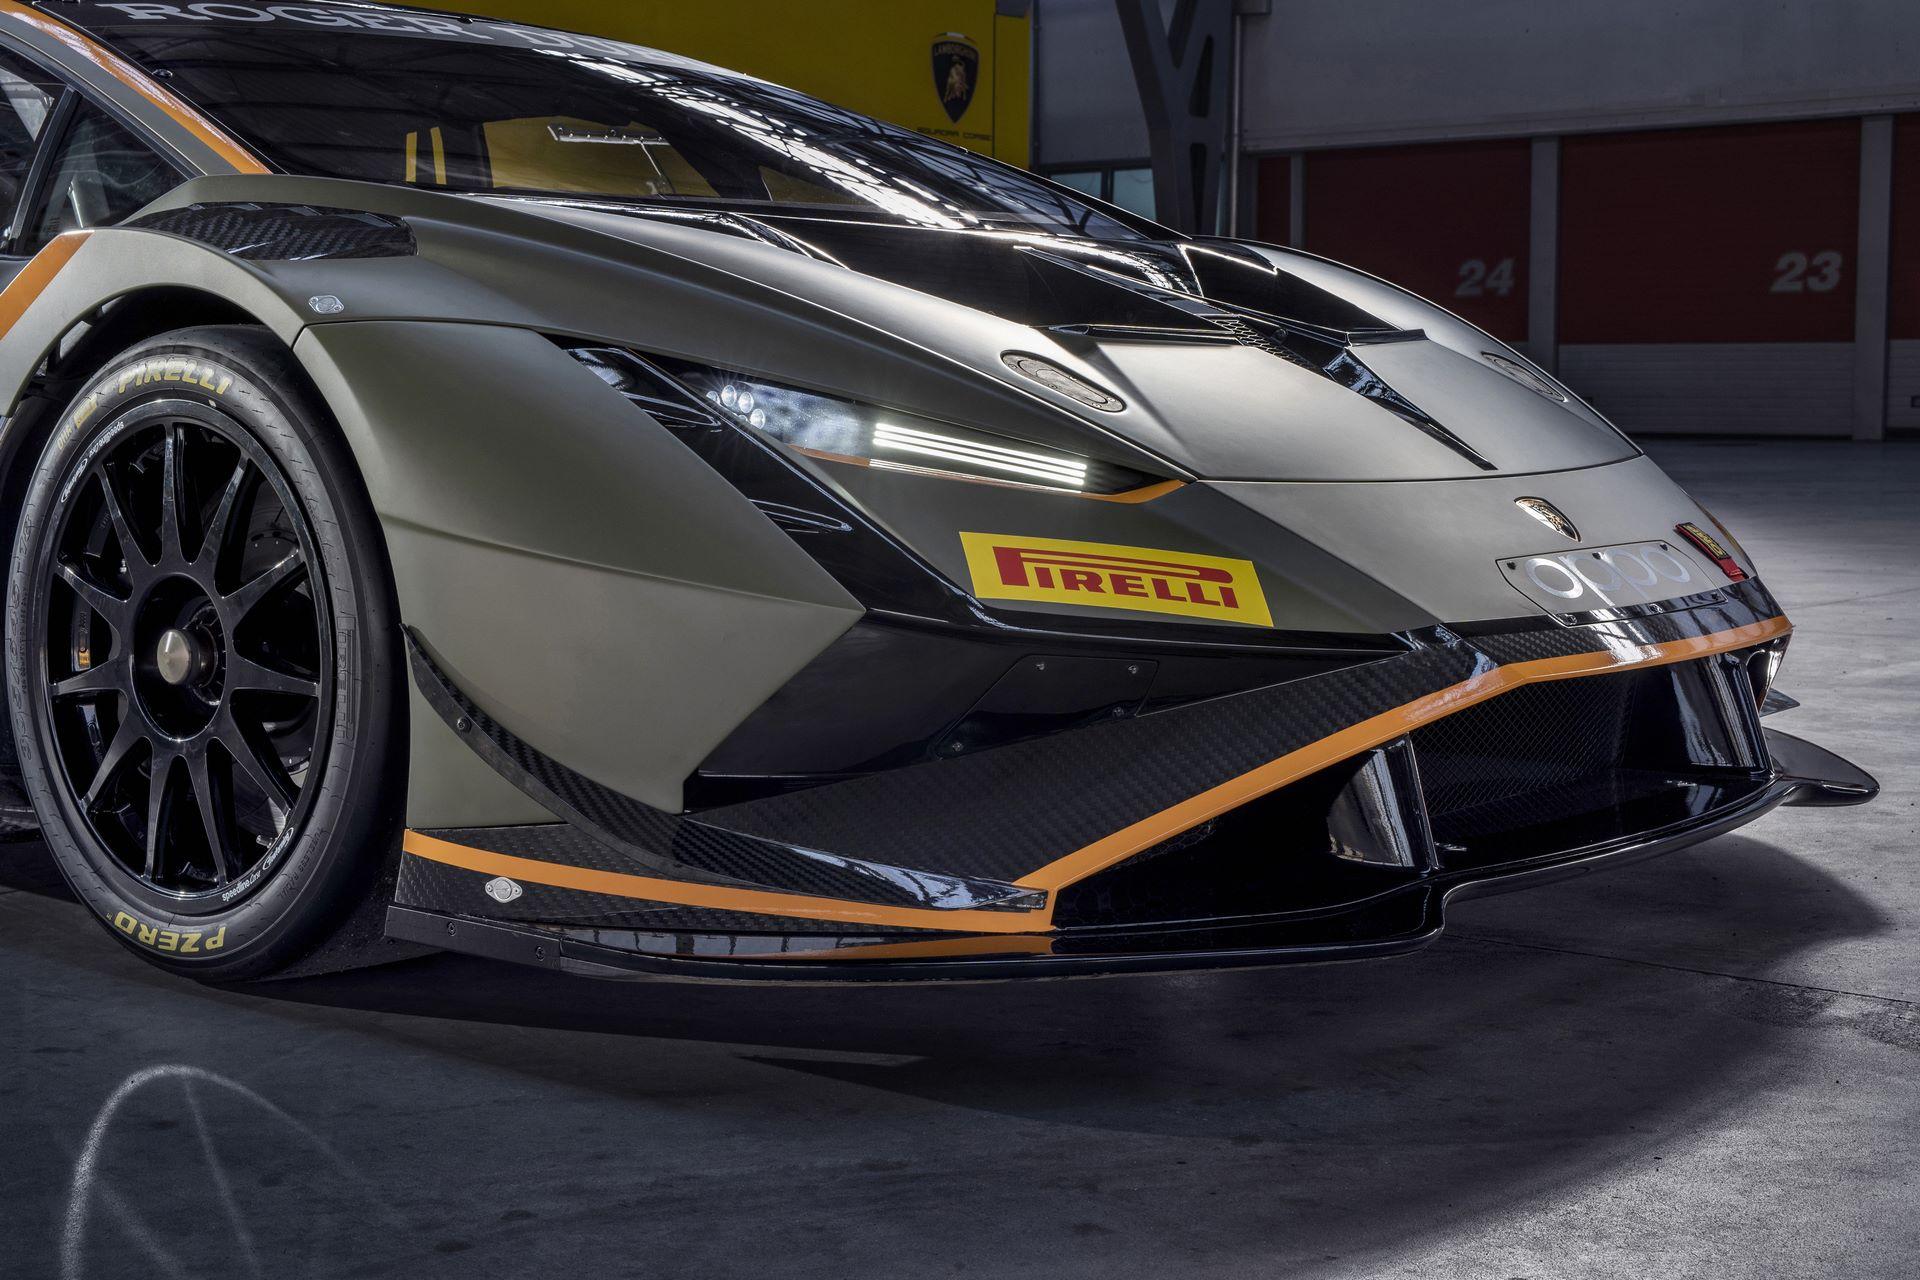 Lamborghini-Huracan-Super-Trofeo-EVO2-7